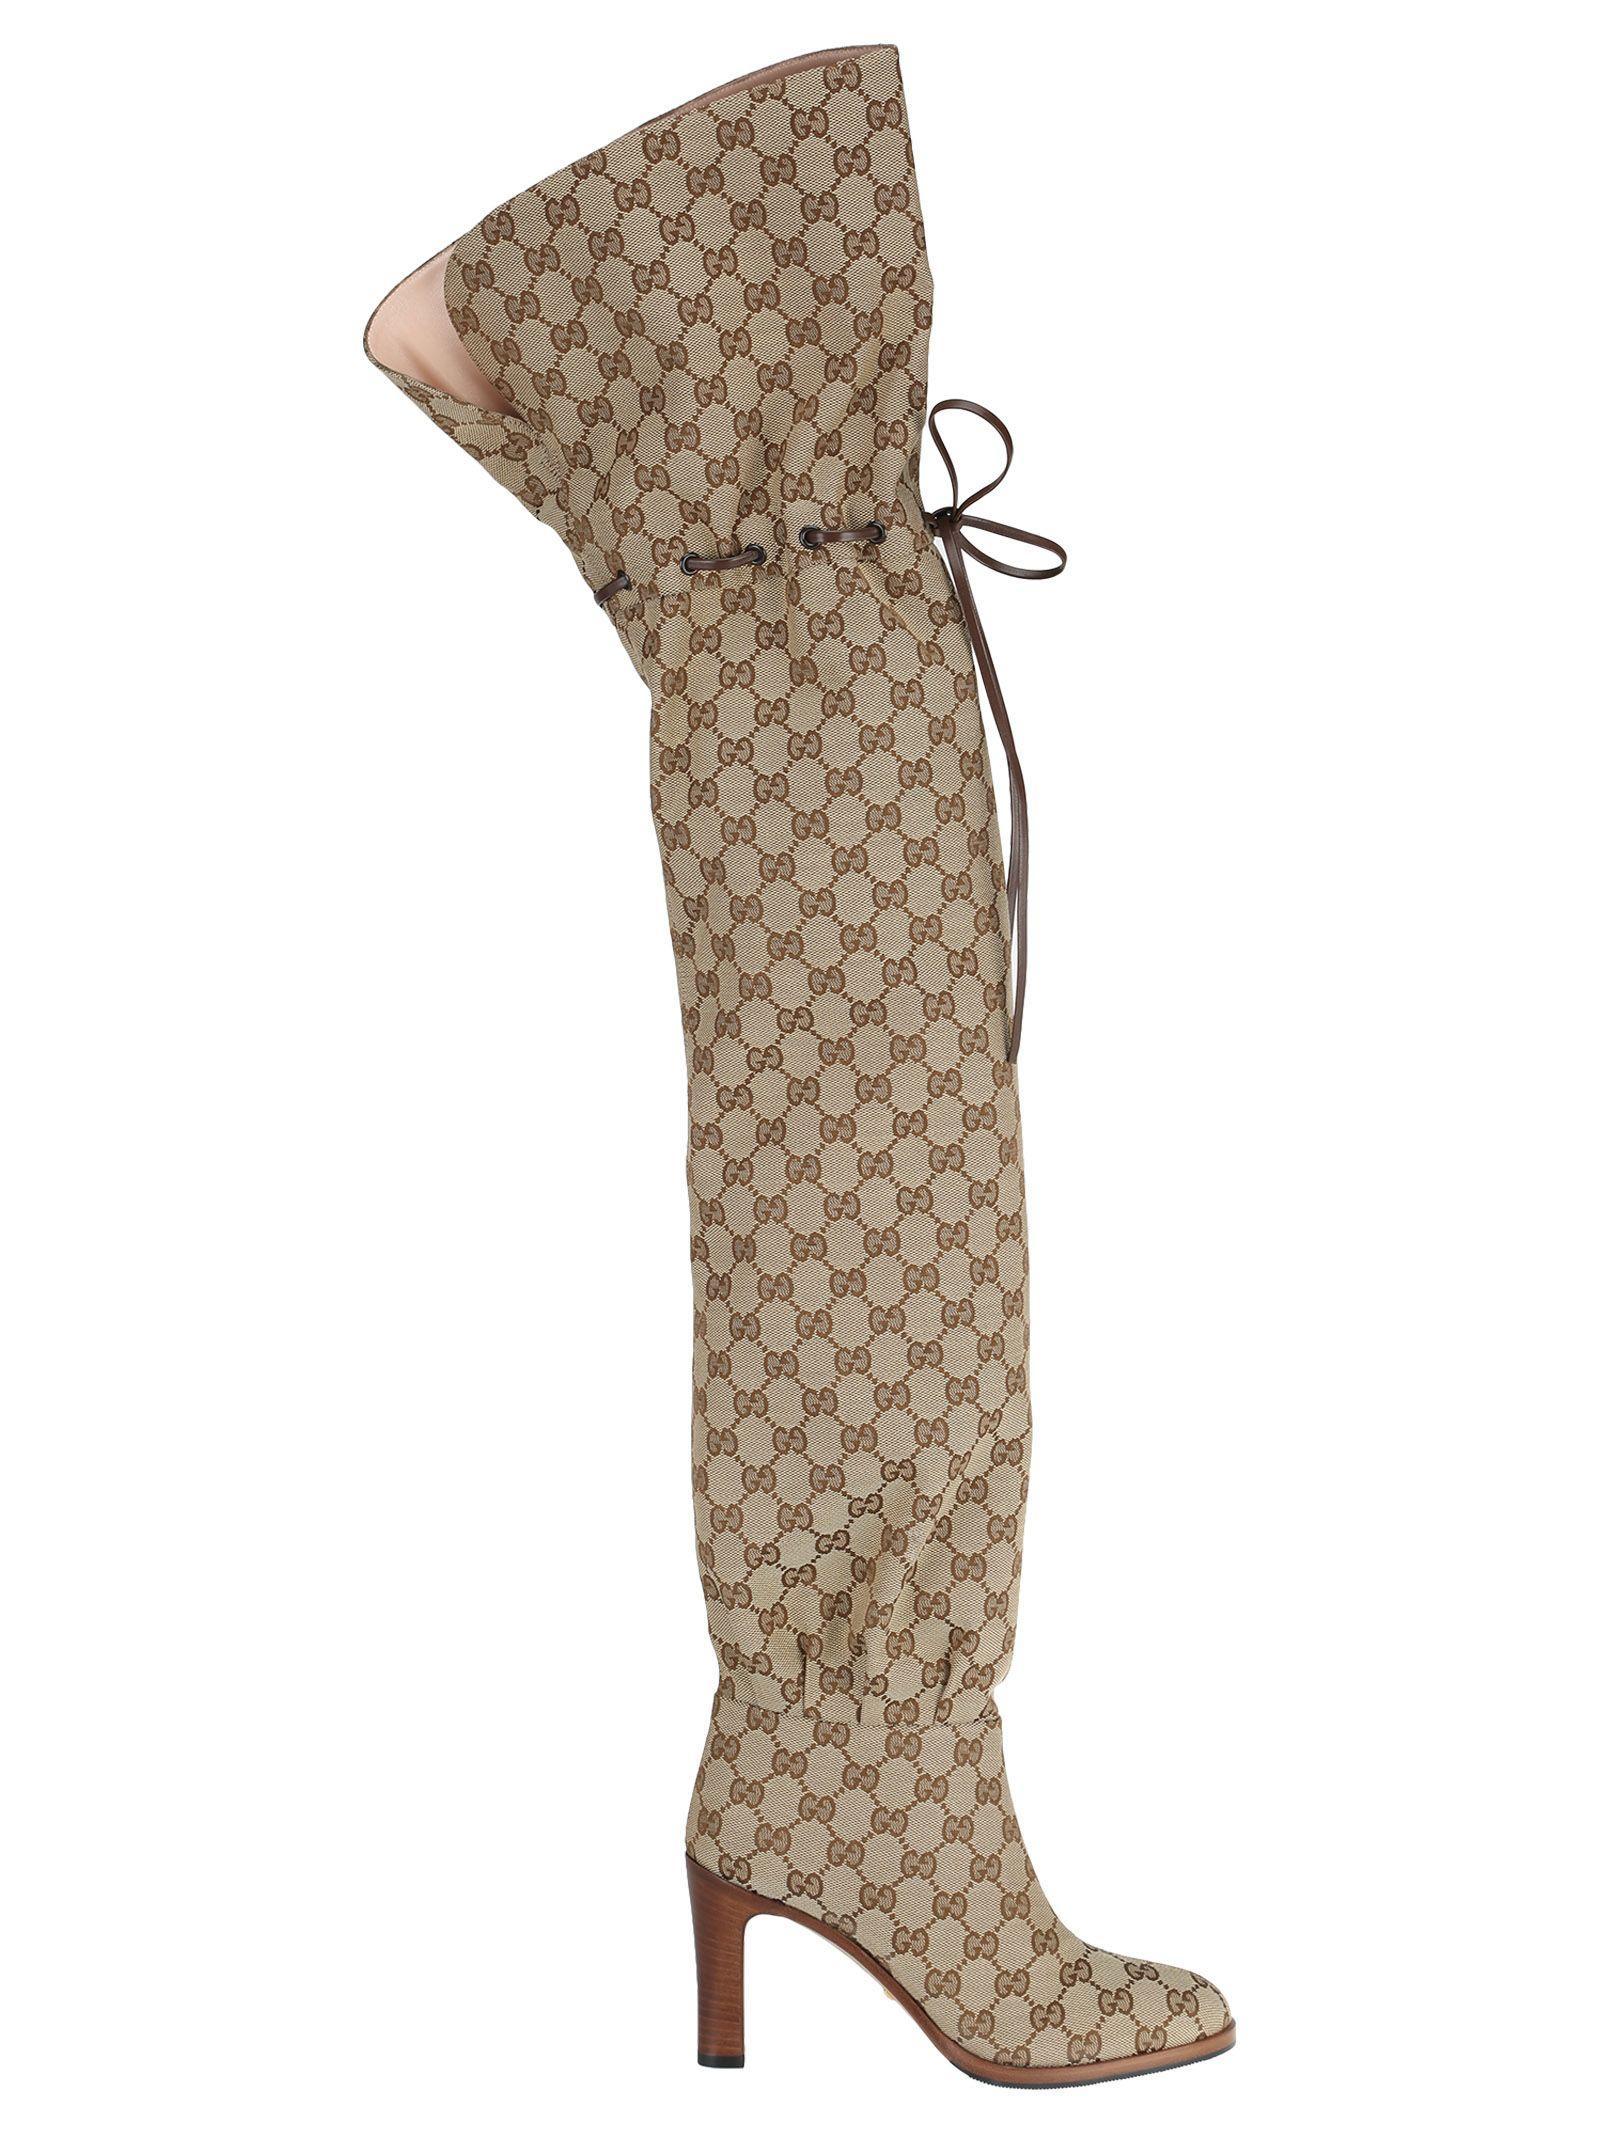 4a66d713d Gucci Original Gg Canvas Over-The-Knee Boots In Neutrals | ModeSens